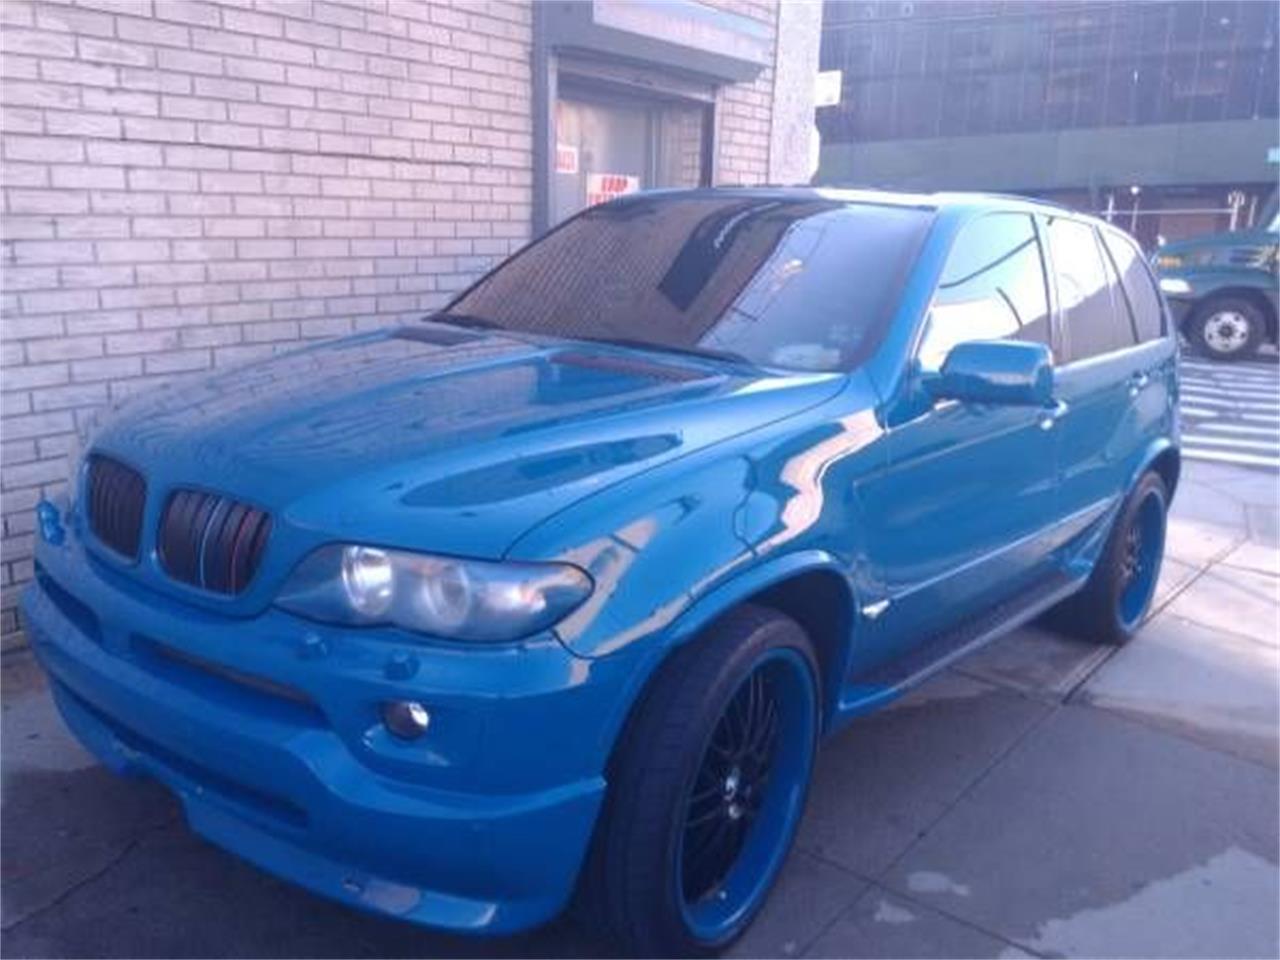 for sale 2002 bmw x5 in cadillac, michigan cars - cadillac, mi at geebo